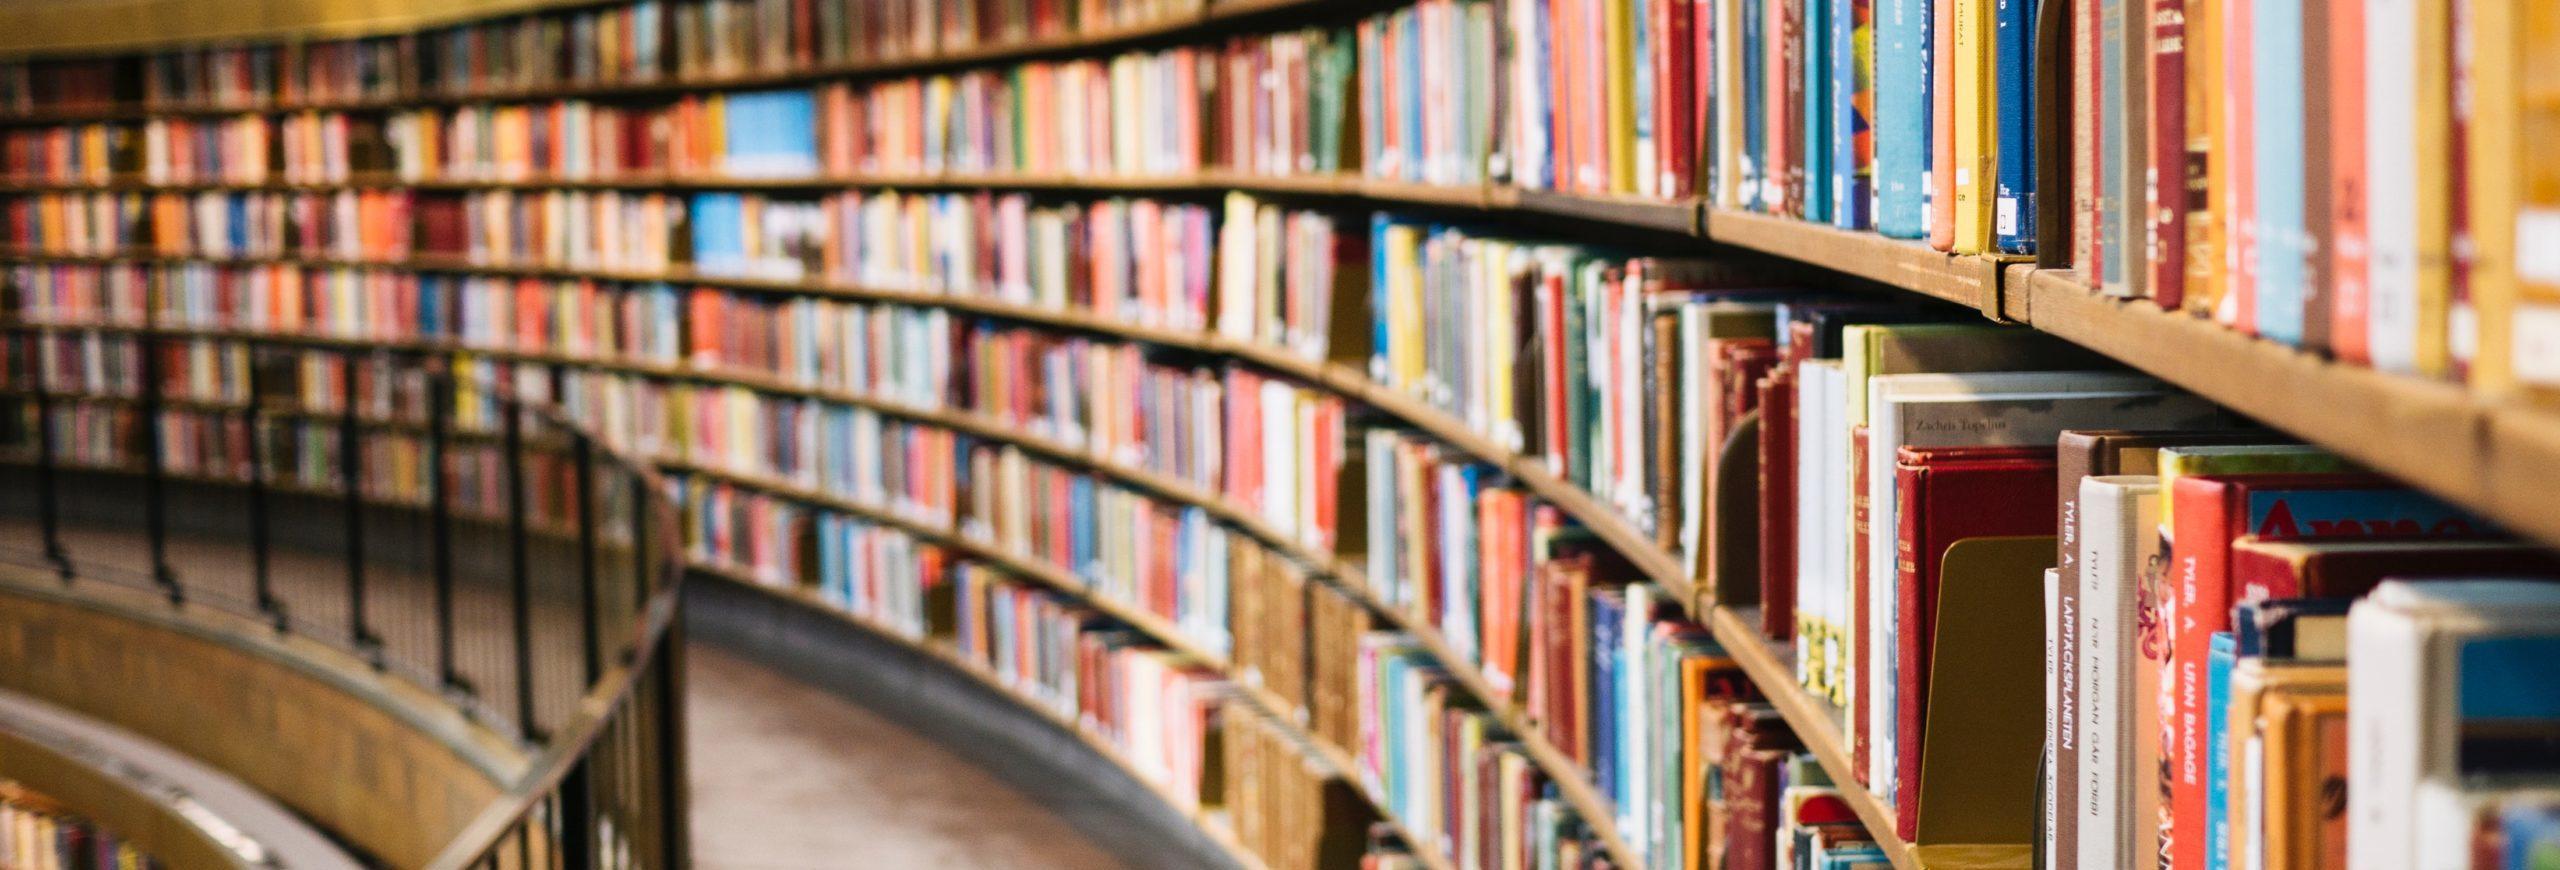 Shelfs full of books in a library ©Susan Yin, unsplash.com